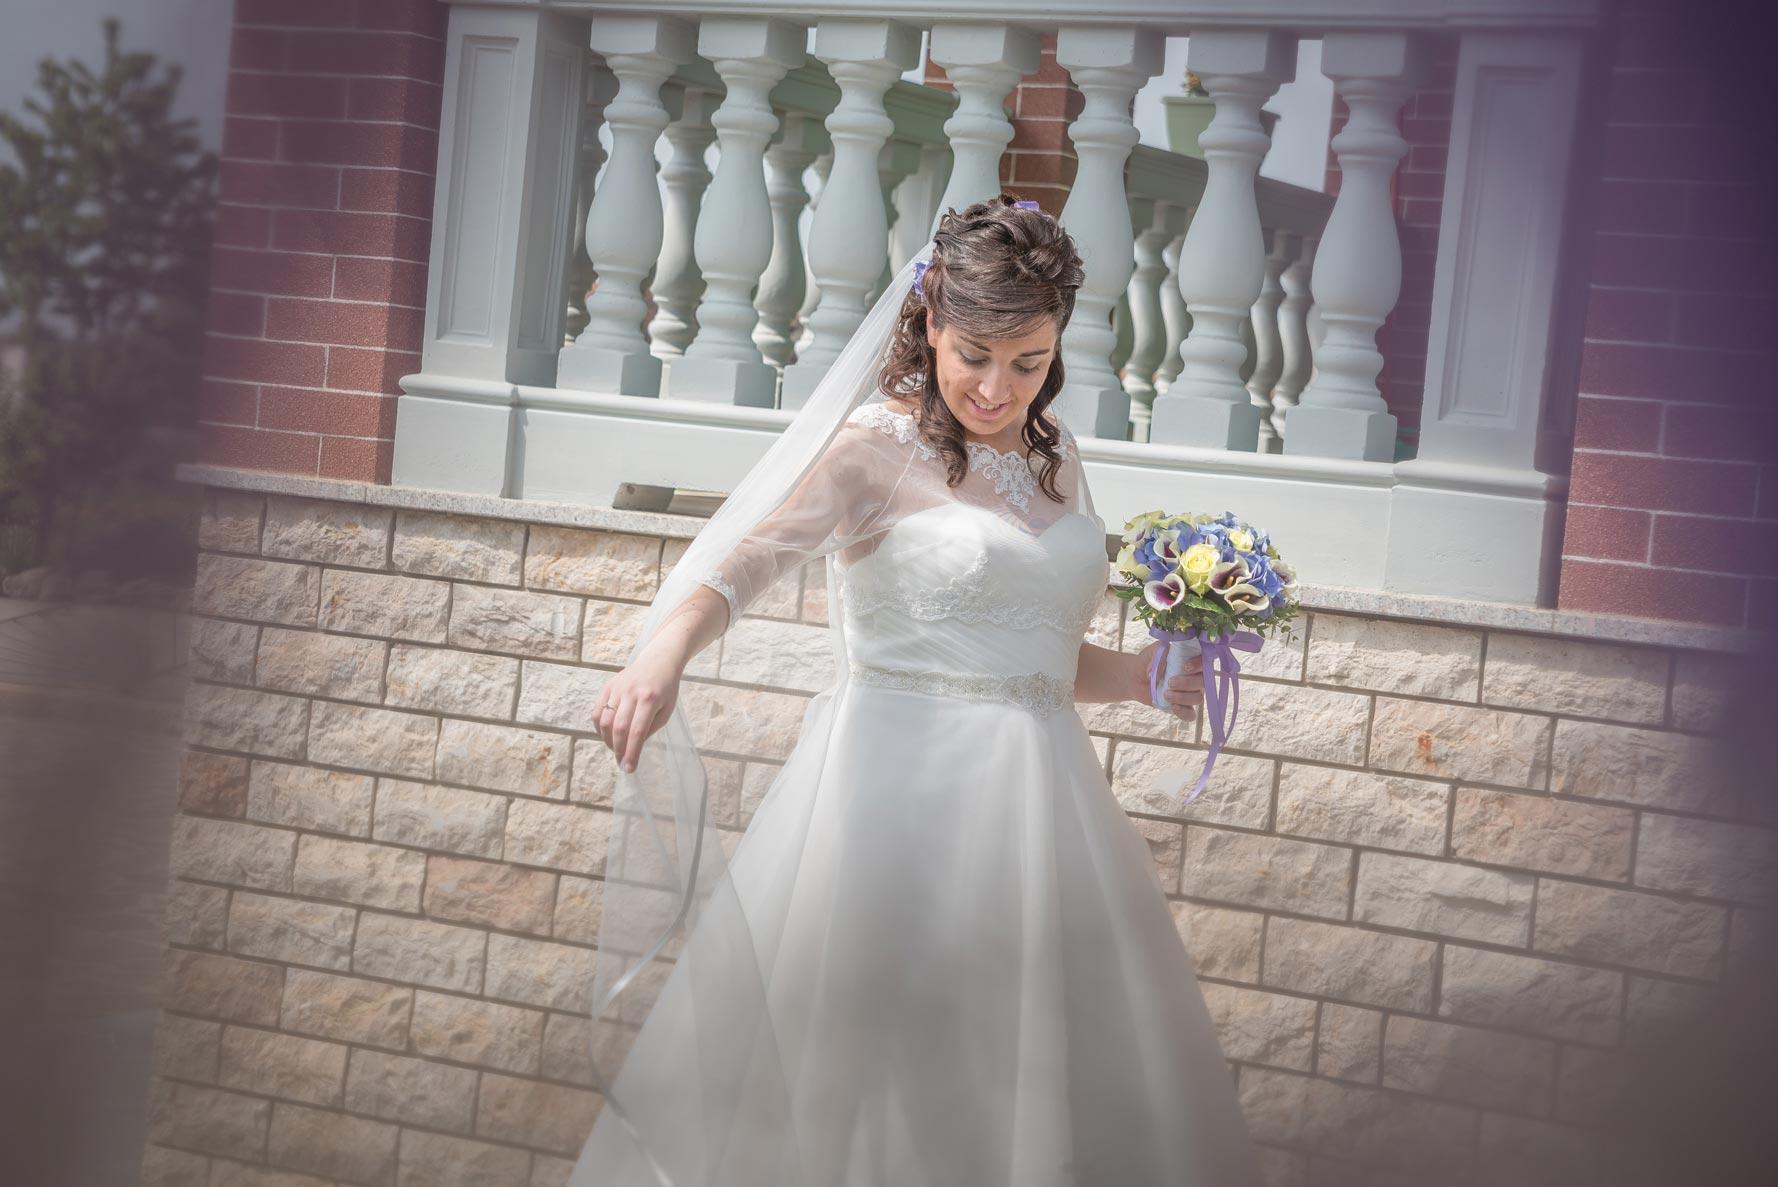 Matrimonio a Narzole Lorenza Diego - DSC 2854 - Fotografie matrimonio sposa - Fotografie matrimonio sposa